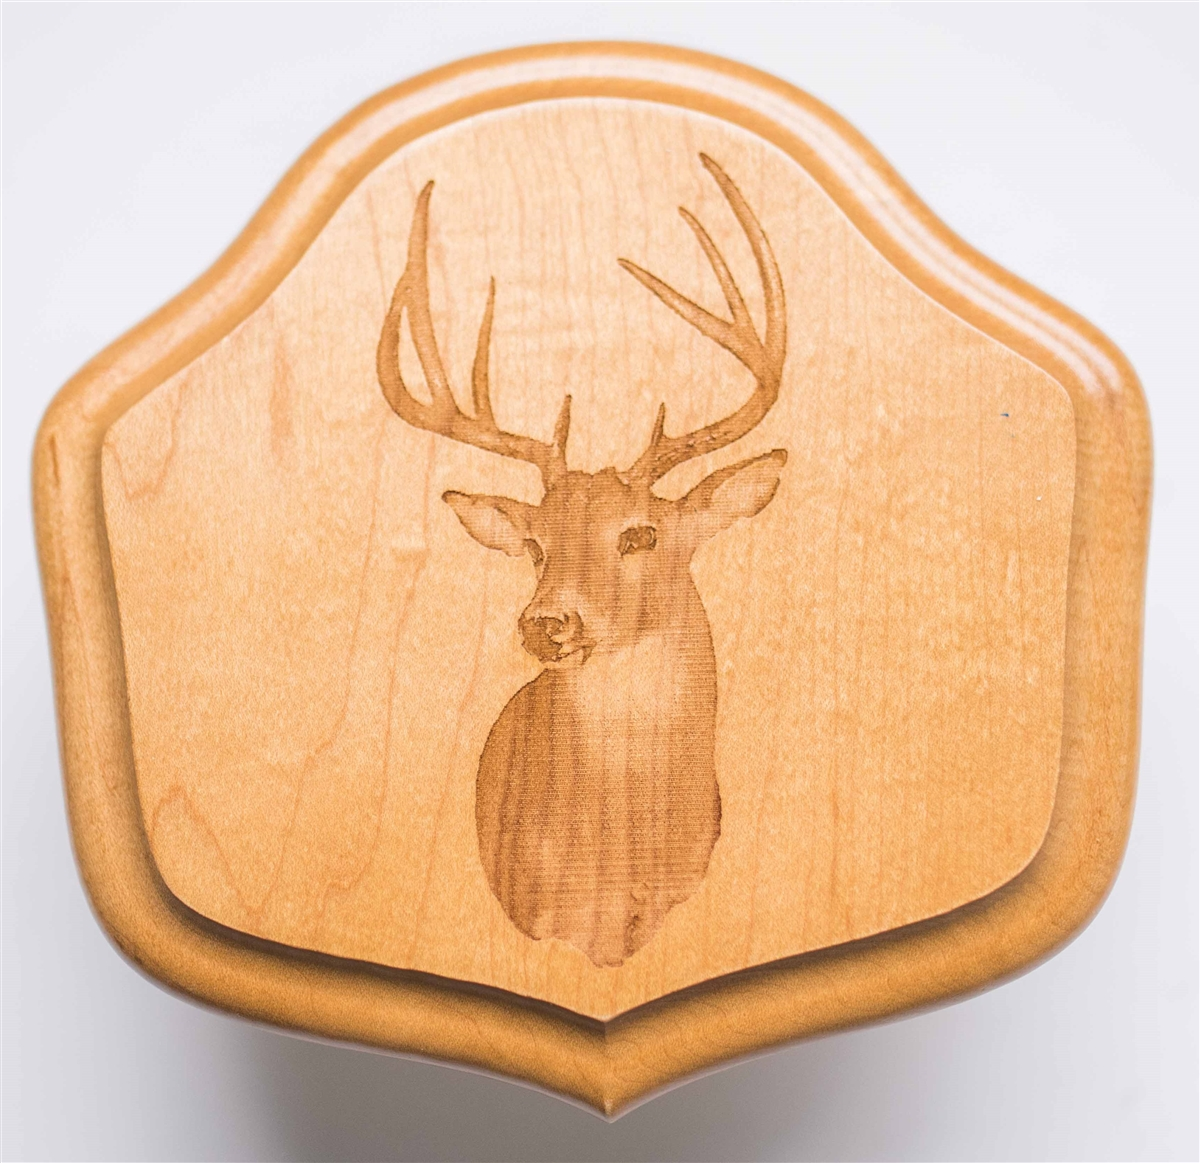 Deer antler mounting kit instructions - Deer Antler Mounting Kit Instructions 32